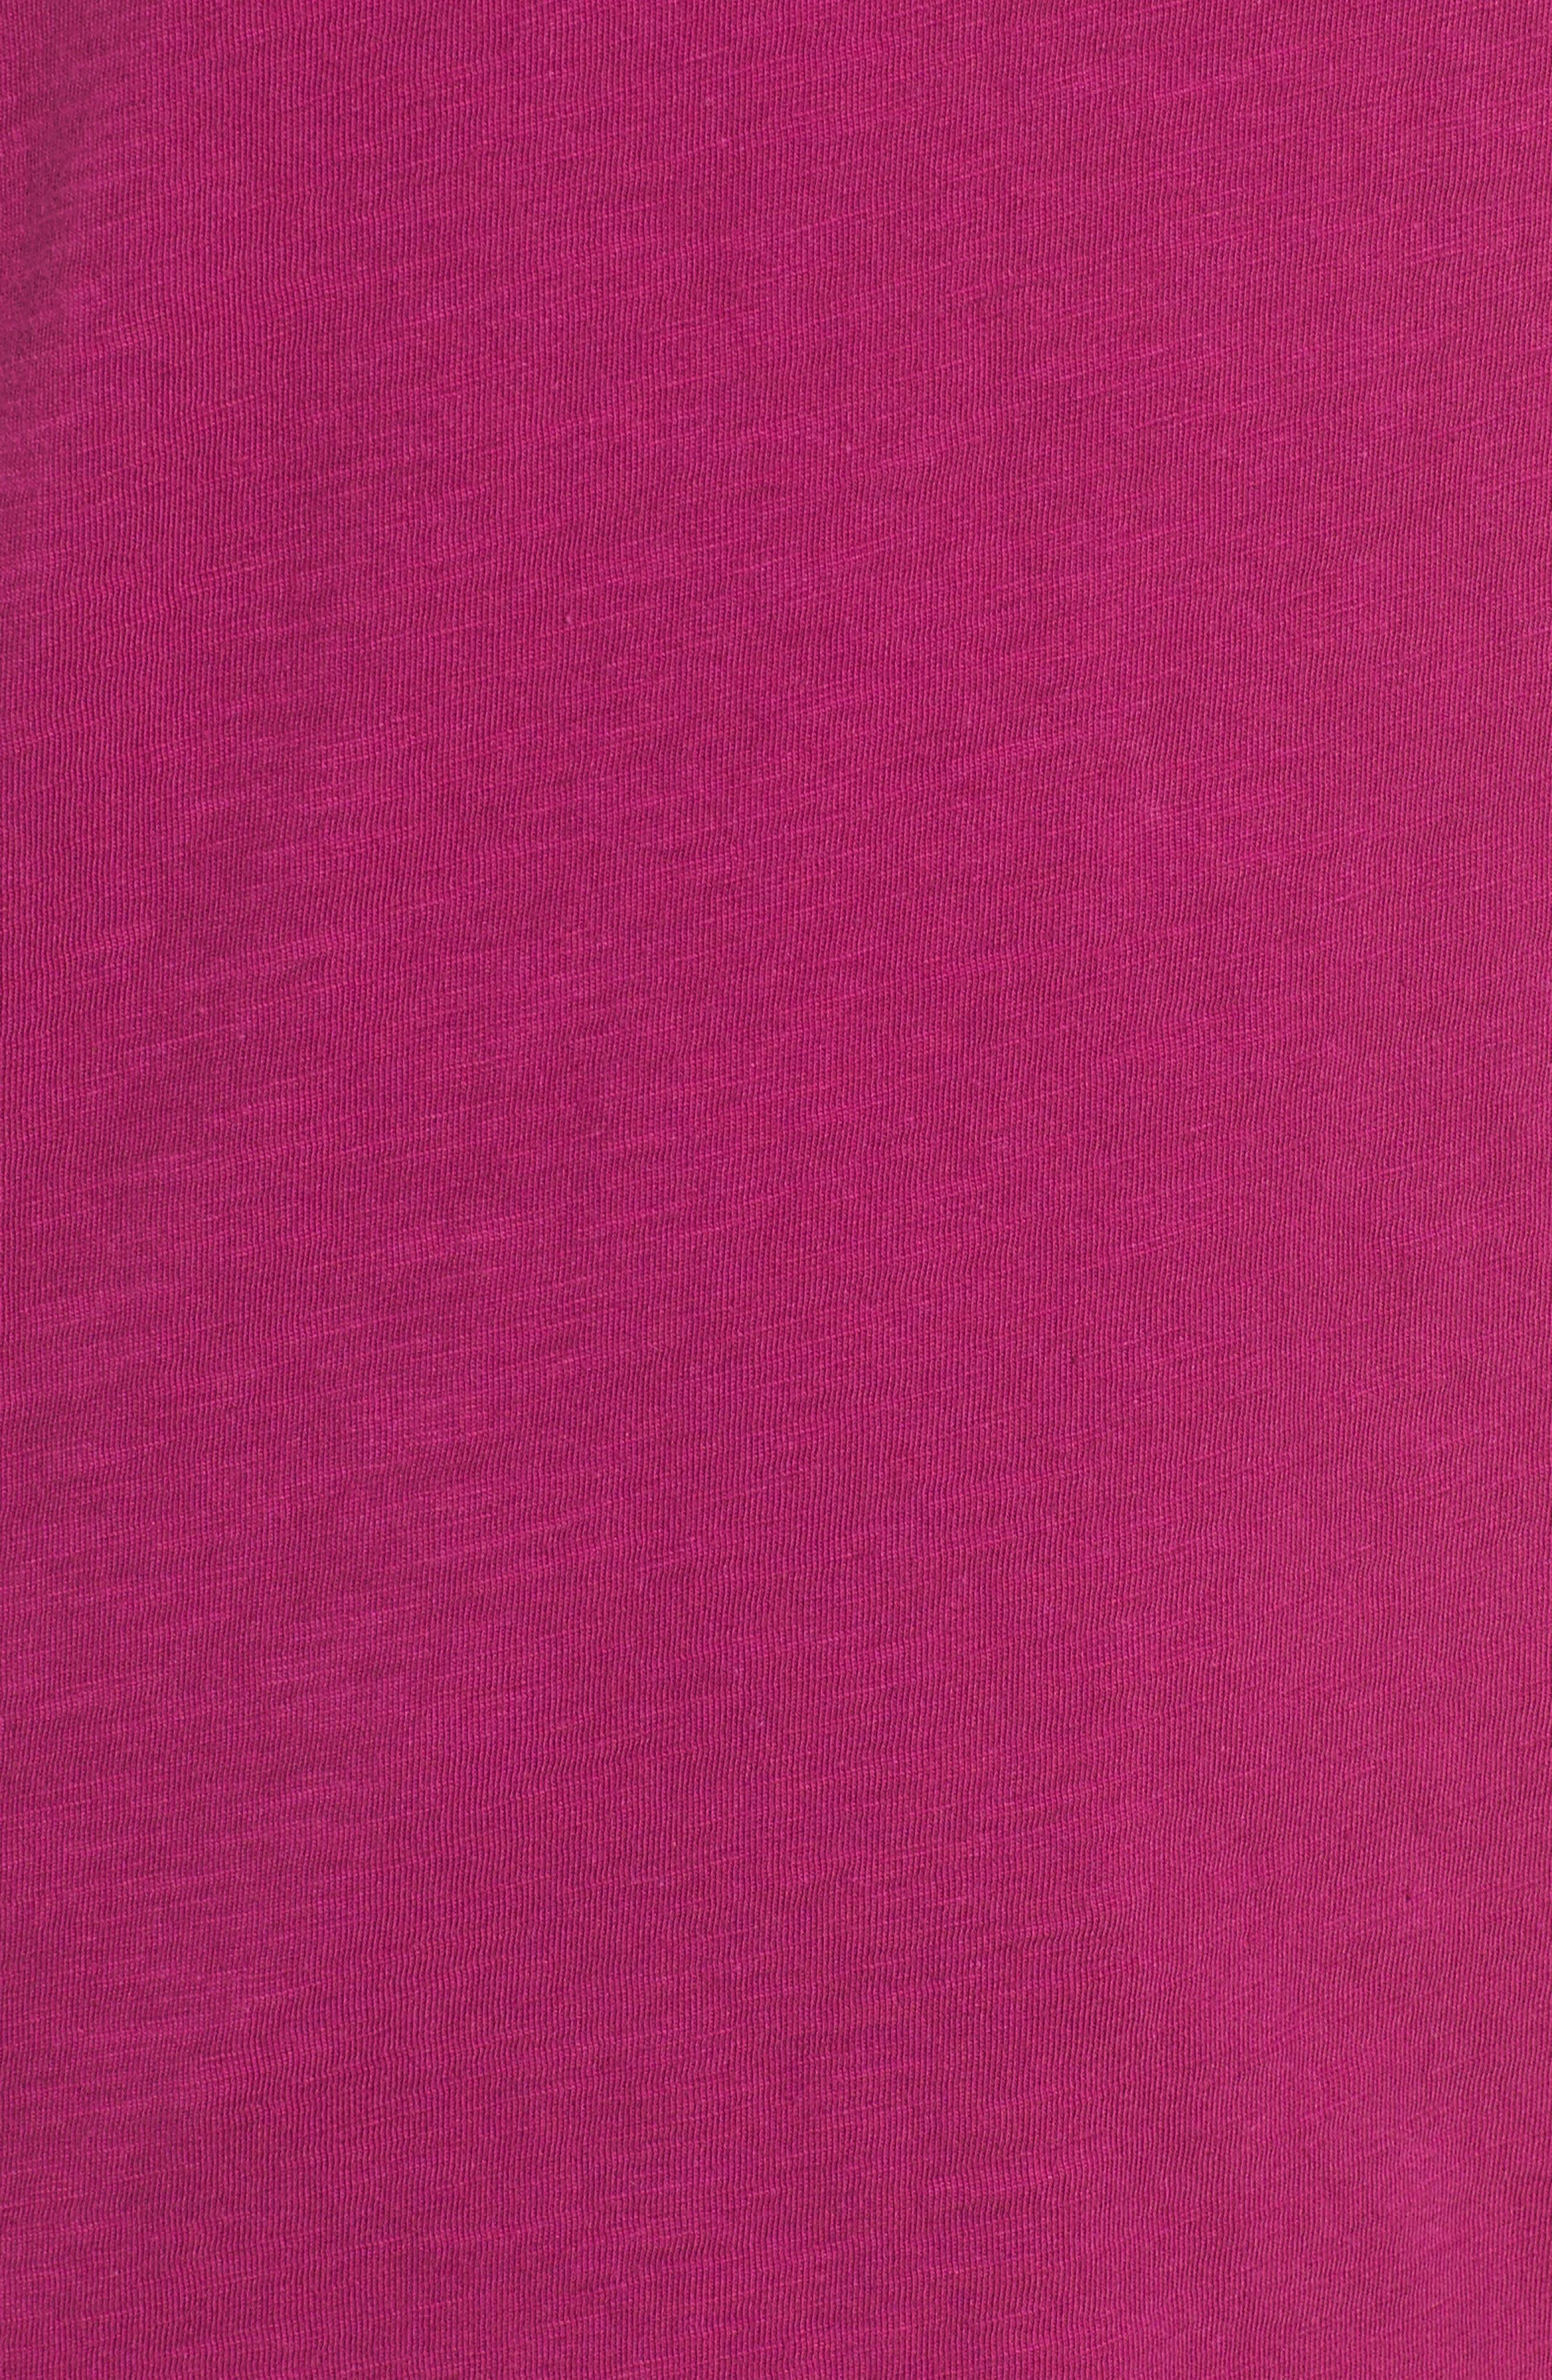 Organic Cotton V-Neck Tee,                             Alternate thumbnail 79, color,